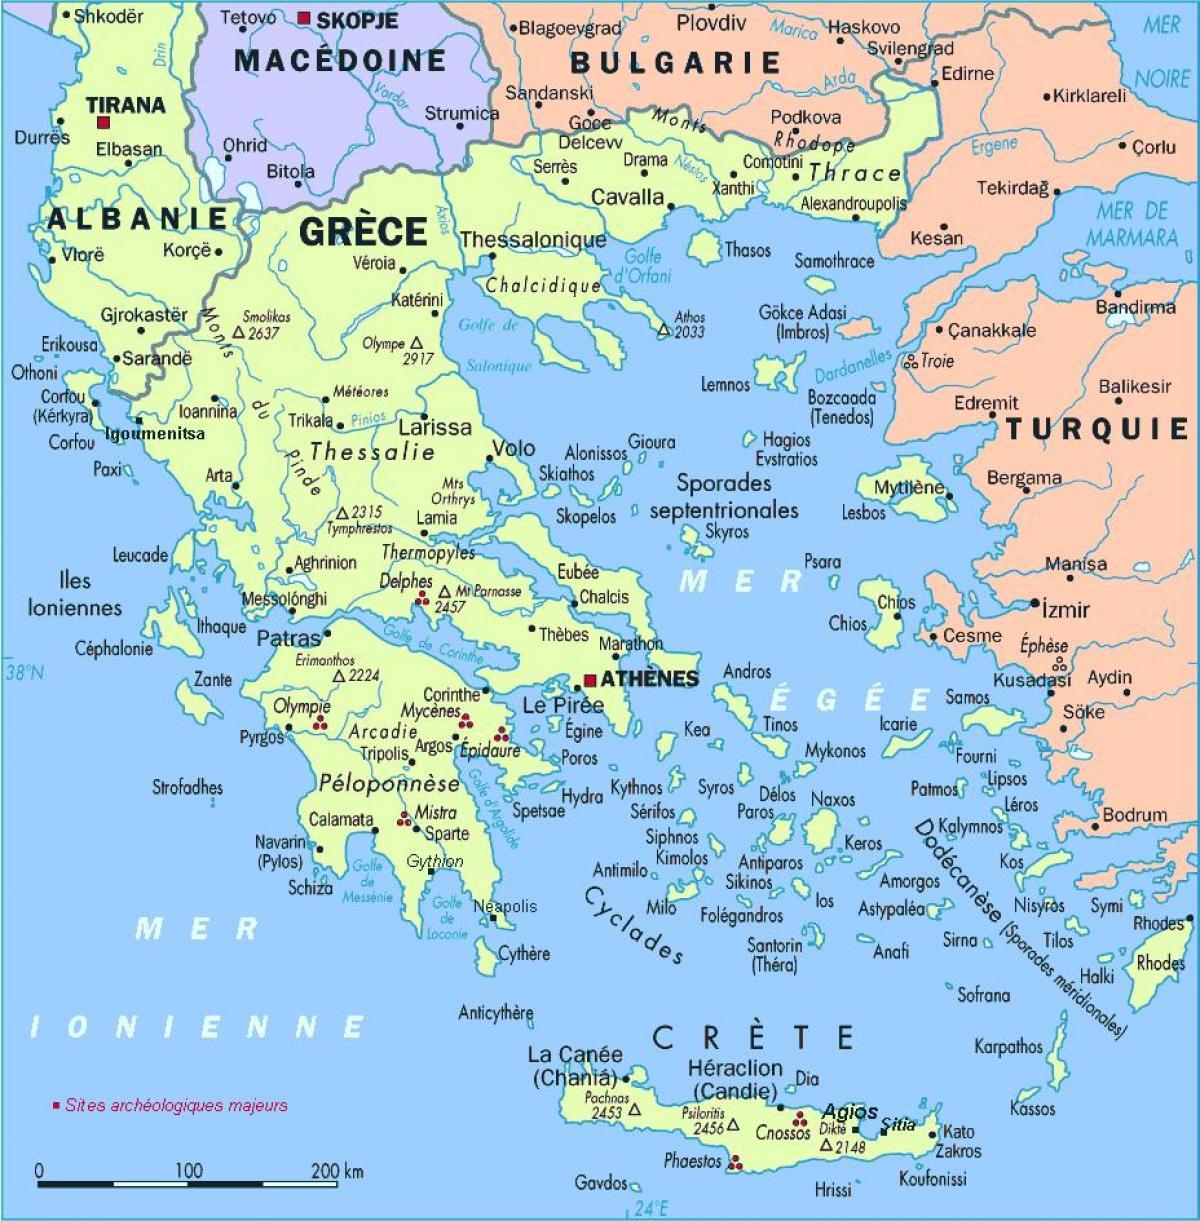 kart over de greske øyene Hellas øyene kart   Kart over Hellas med øyer (Sør Europa   Europa) kart over de greske øyene